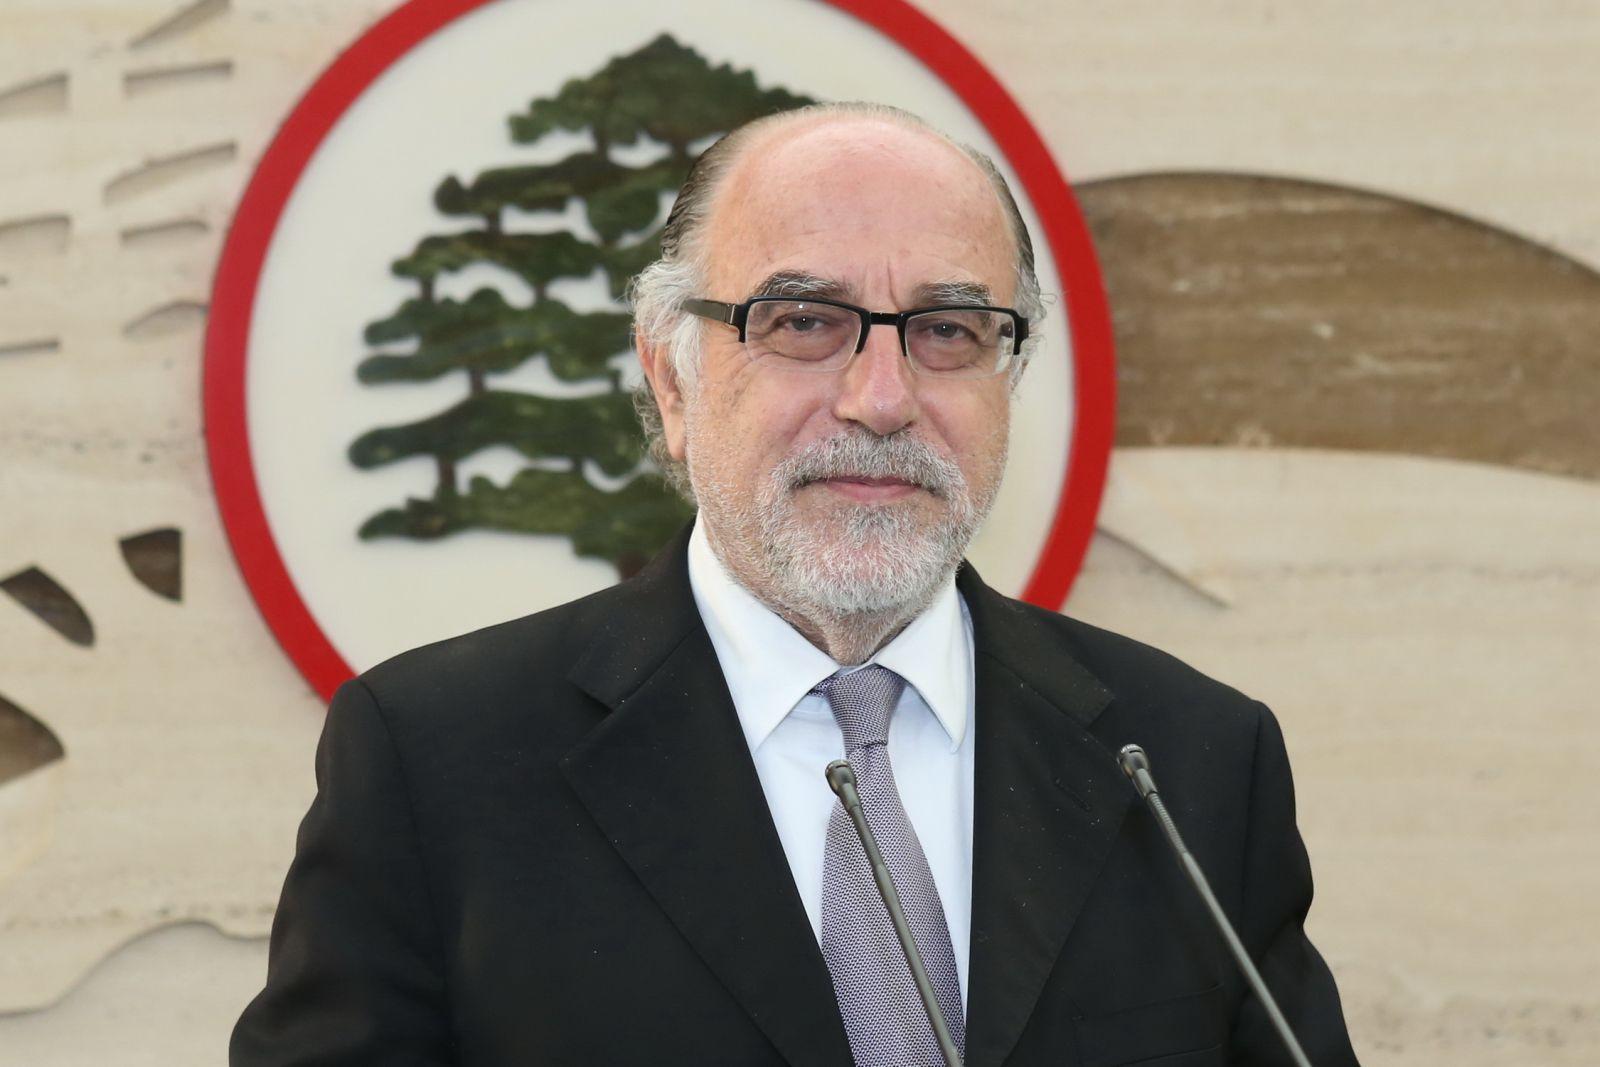 ������ ������� ���� ��� 2013 , ������� �� ������ �������� ���� ��� 2013